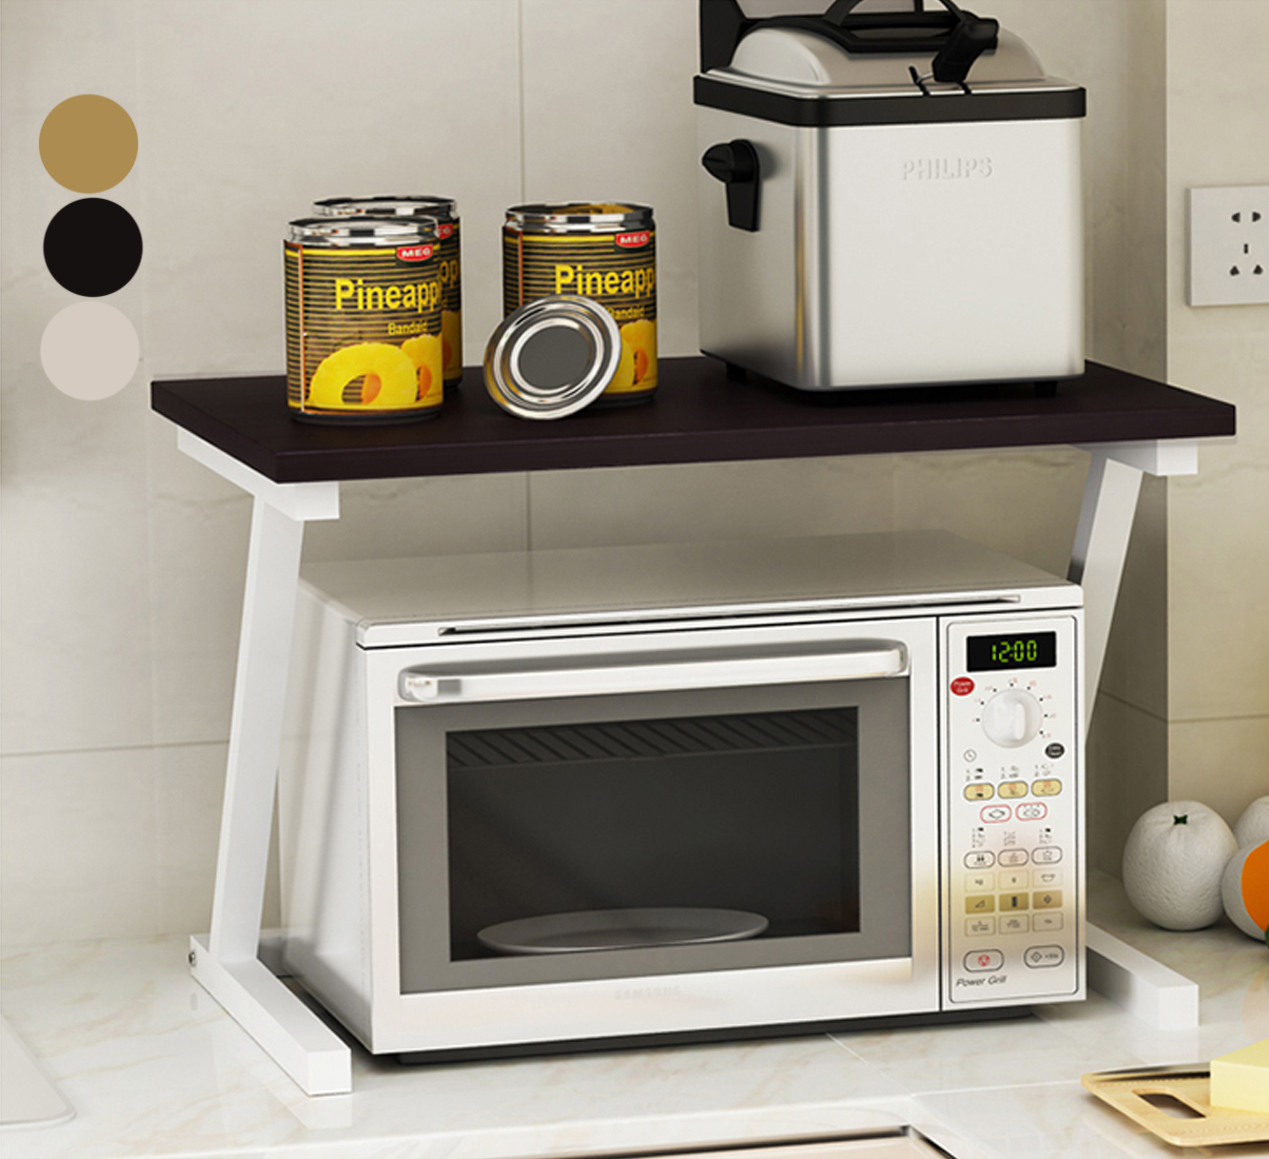 Wooden Kitchen Racks Multi Purpose Storage Rack Microwave Shelves